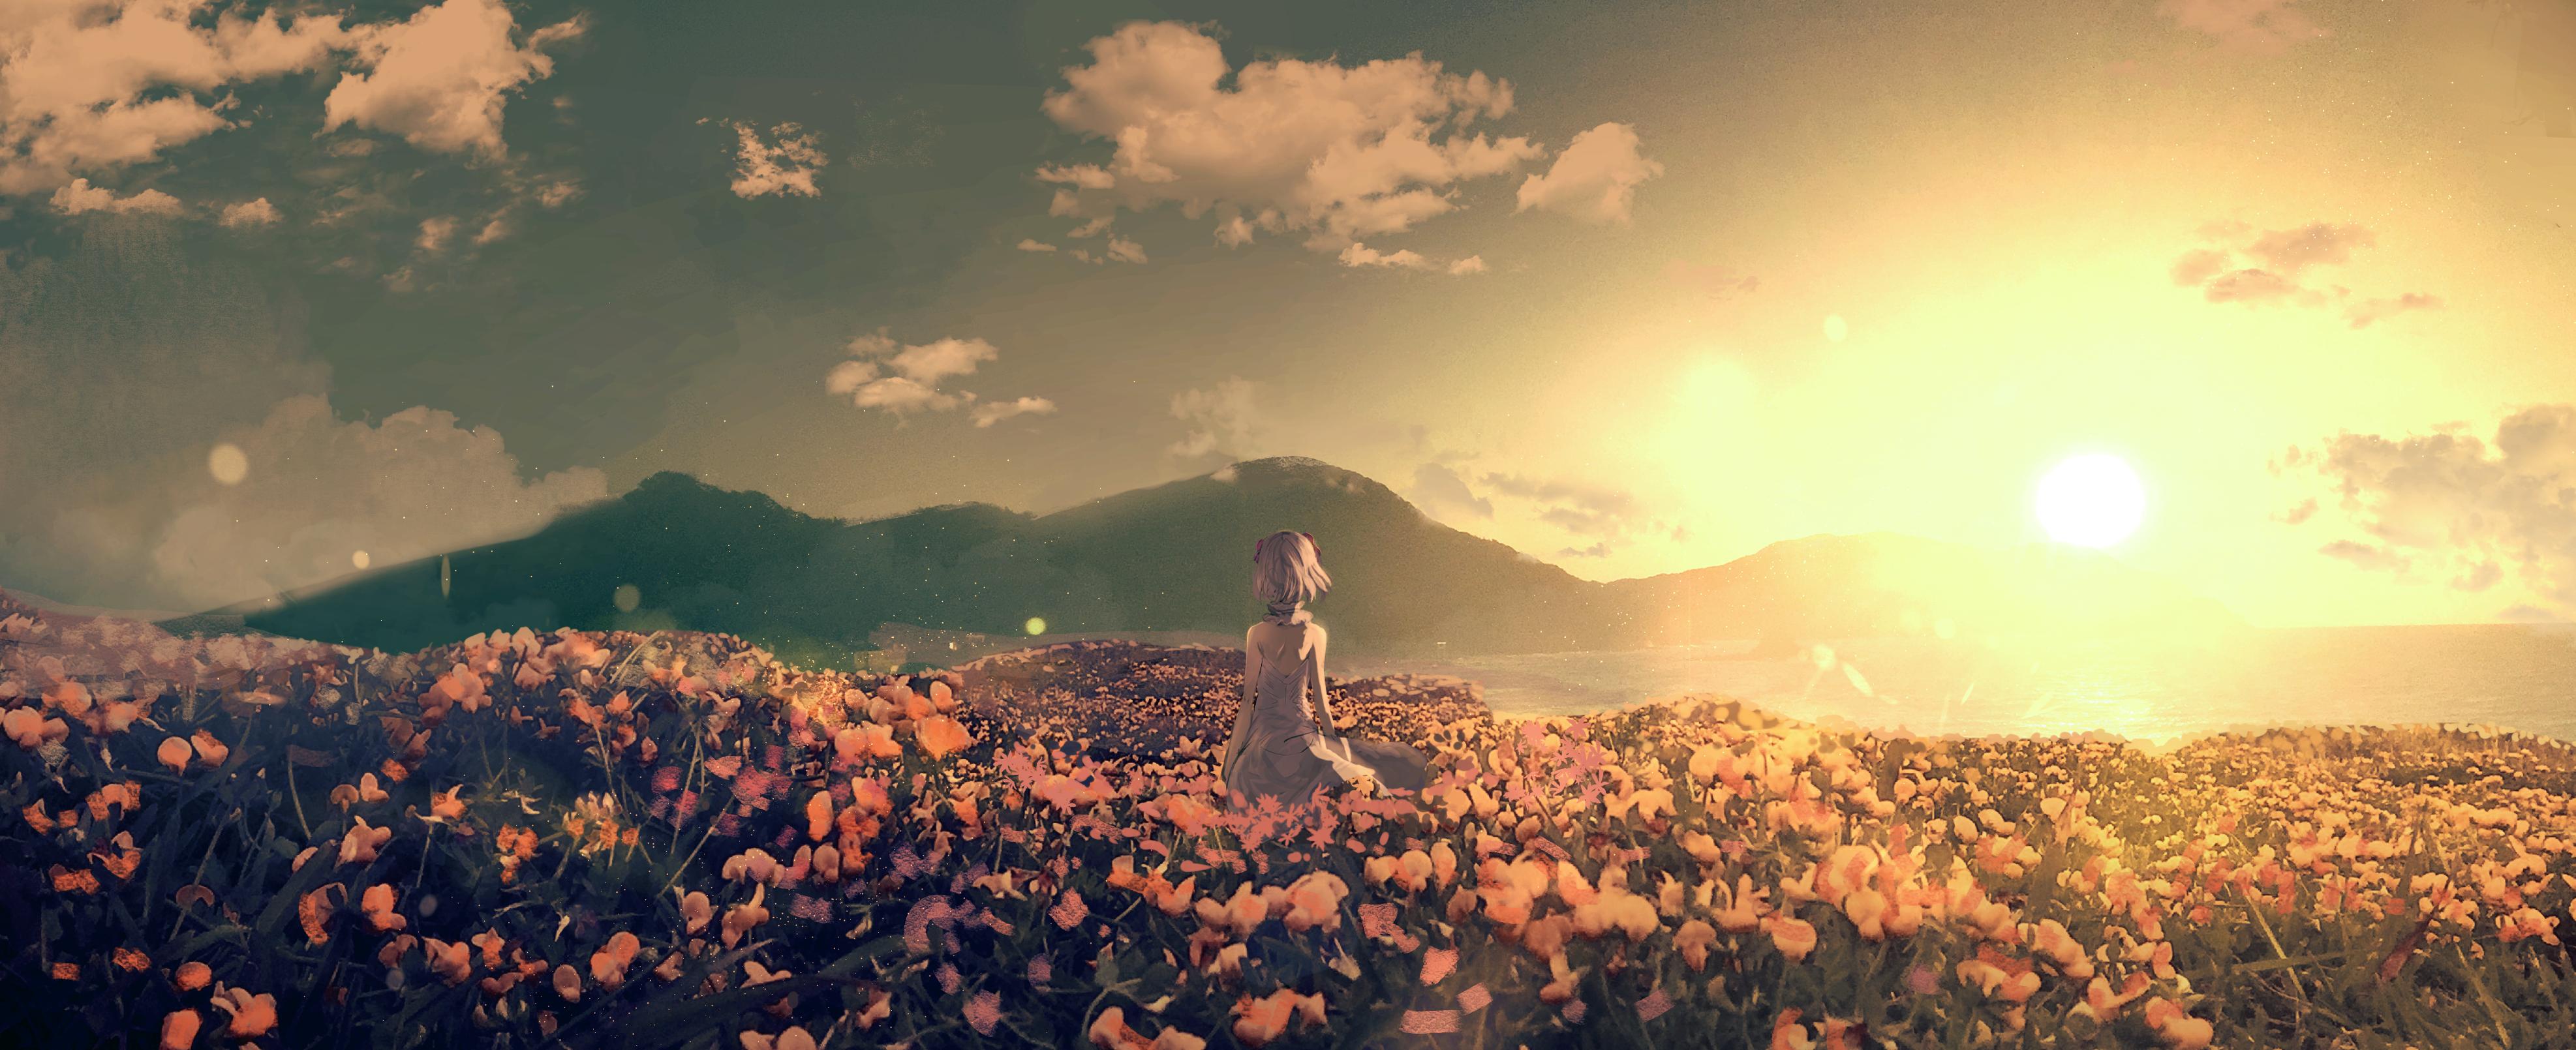 Anime 3948x1610 anime mountains landscape sky clouds sunset